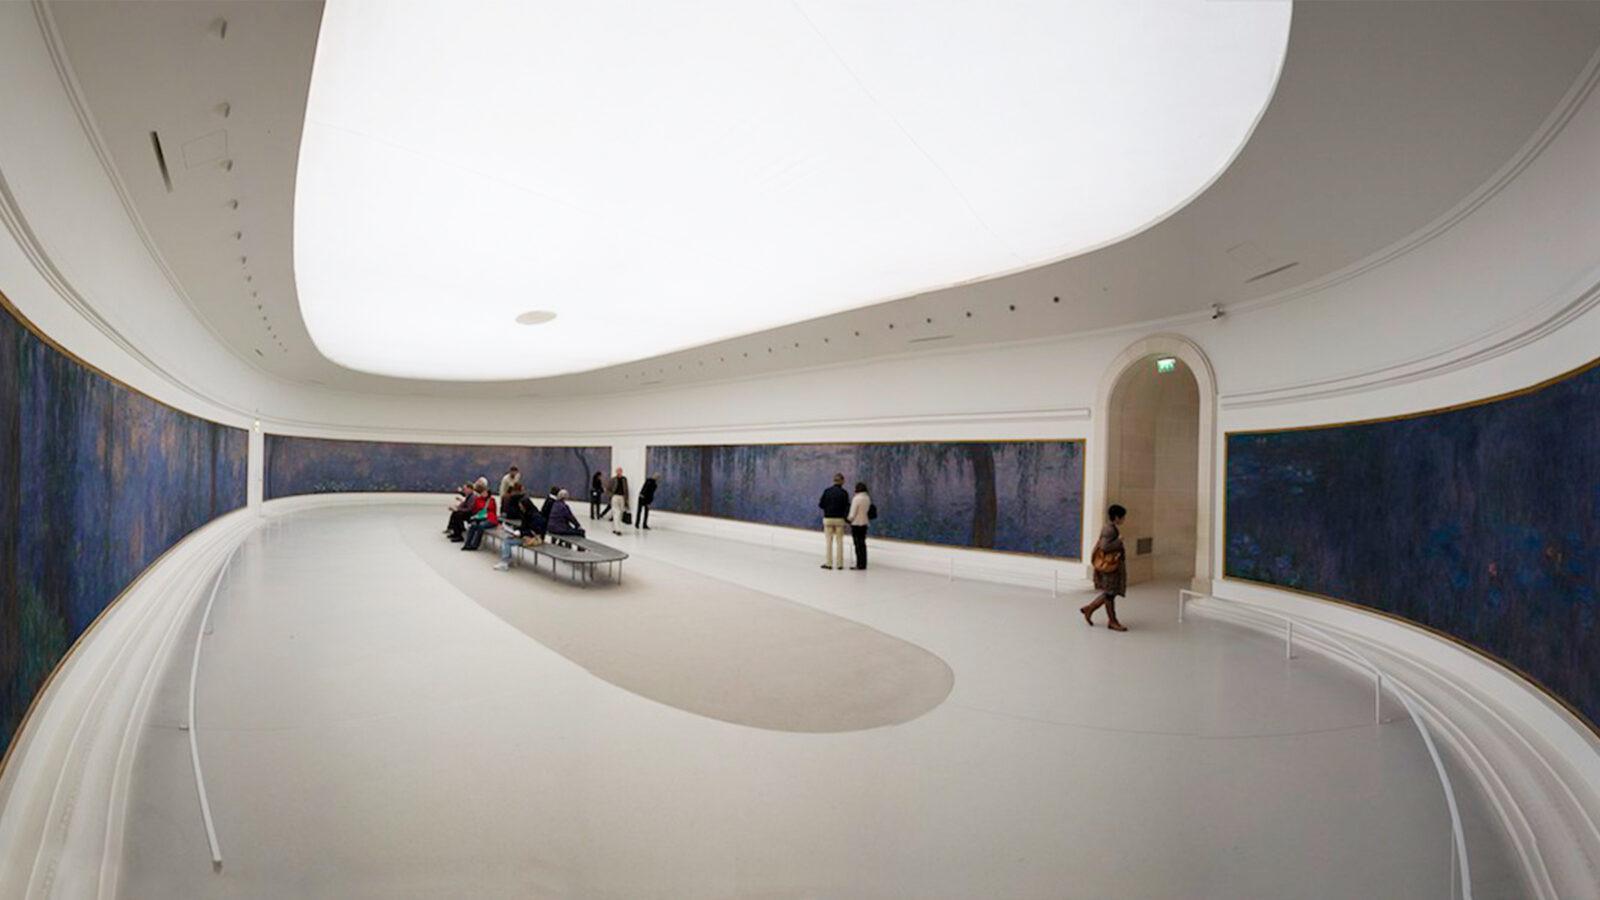 The Interior of Musée de l'Orangerie in Paris, France.